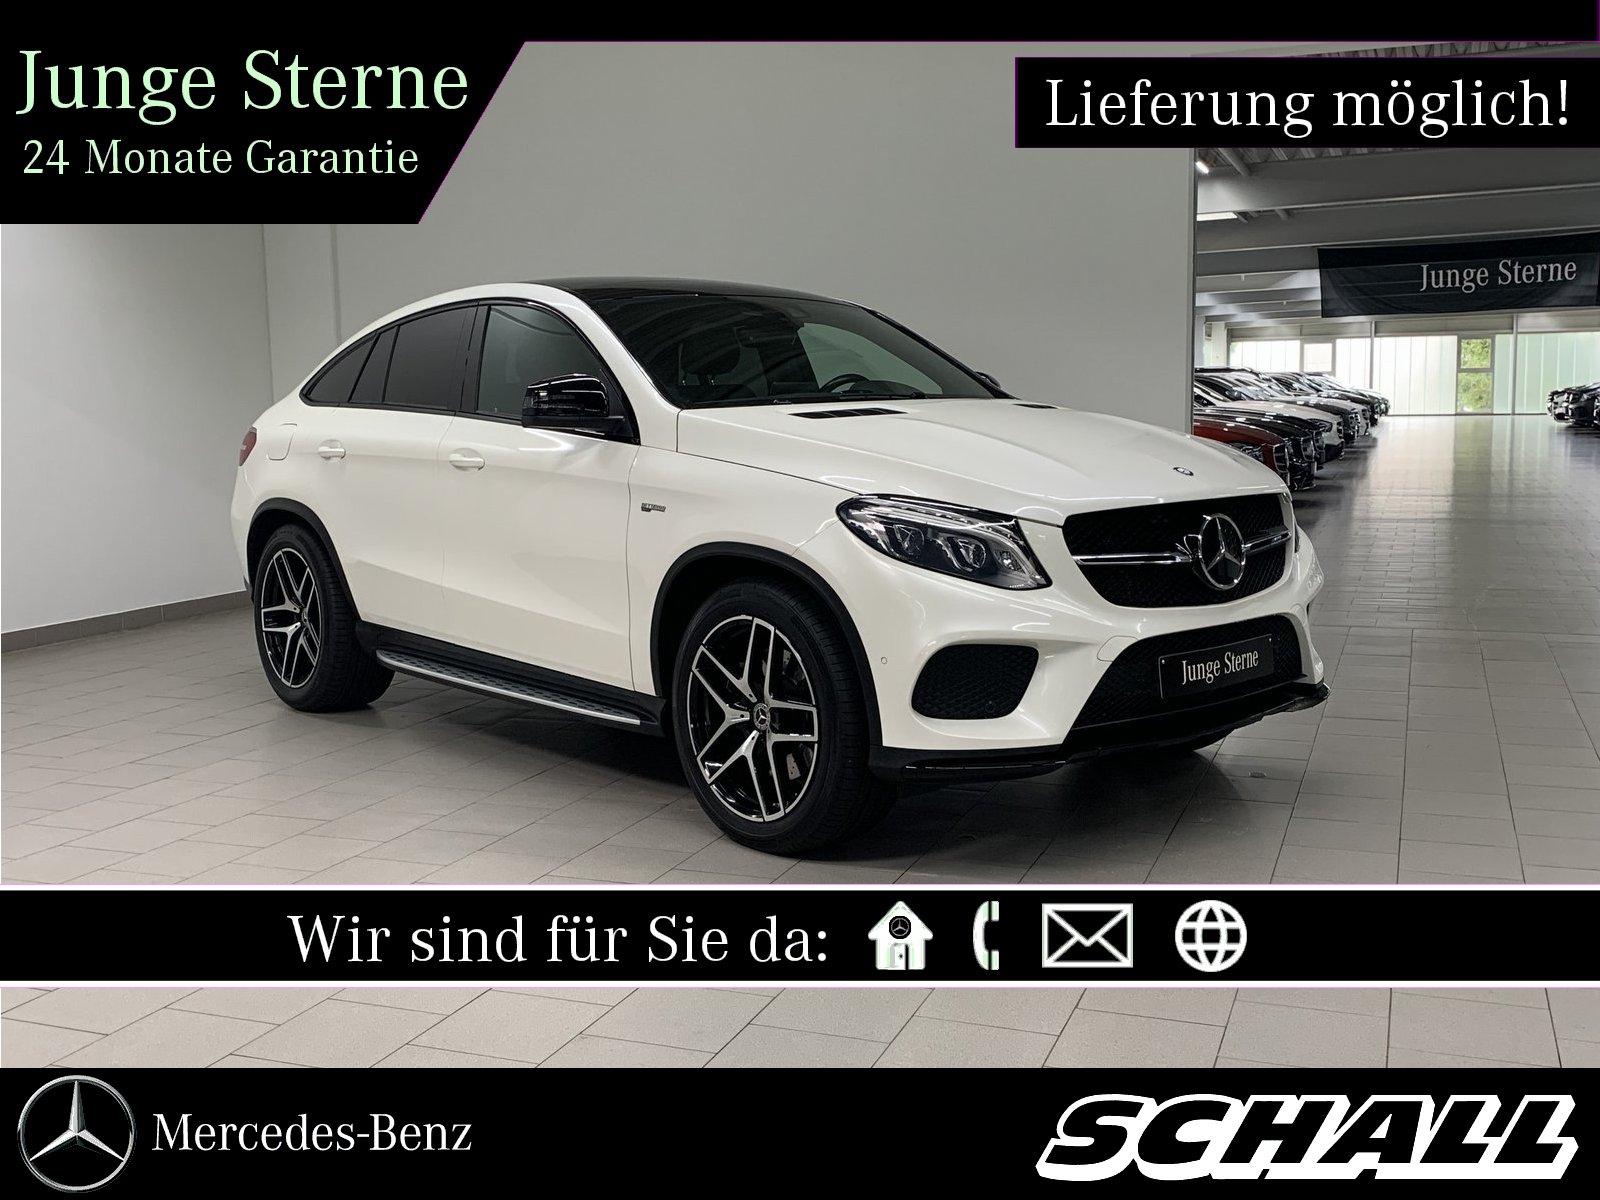 Mercedes-Benz GLE 43 AMG 4M COUPÉ AHK+KAMERA+PANO+DISTRONIC, Jahr 2017, Benzin